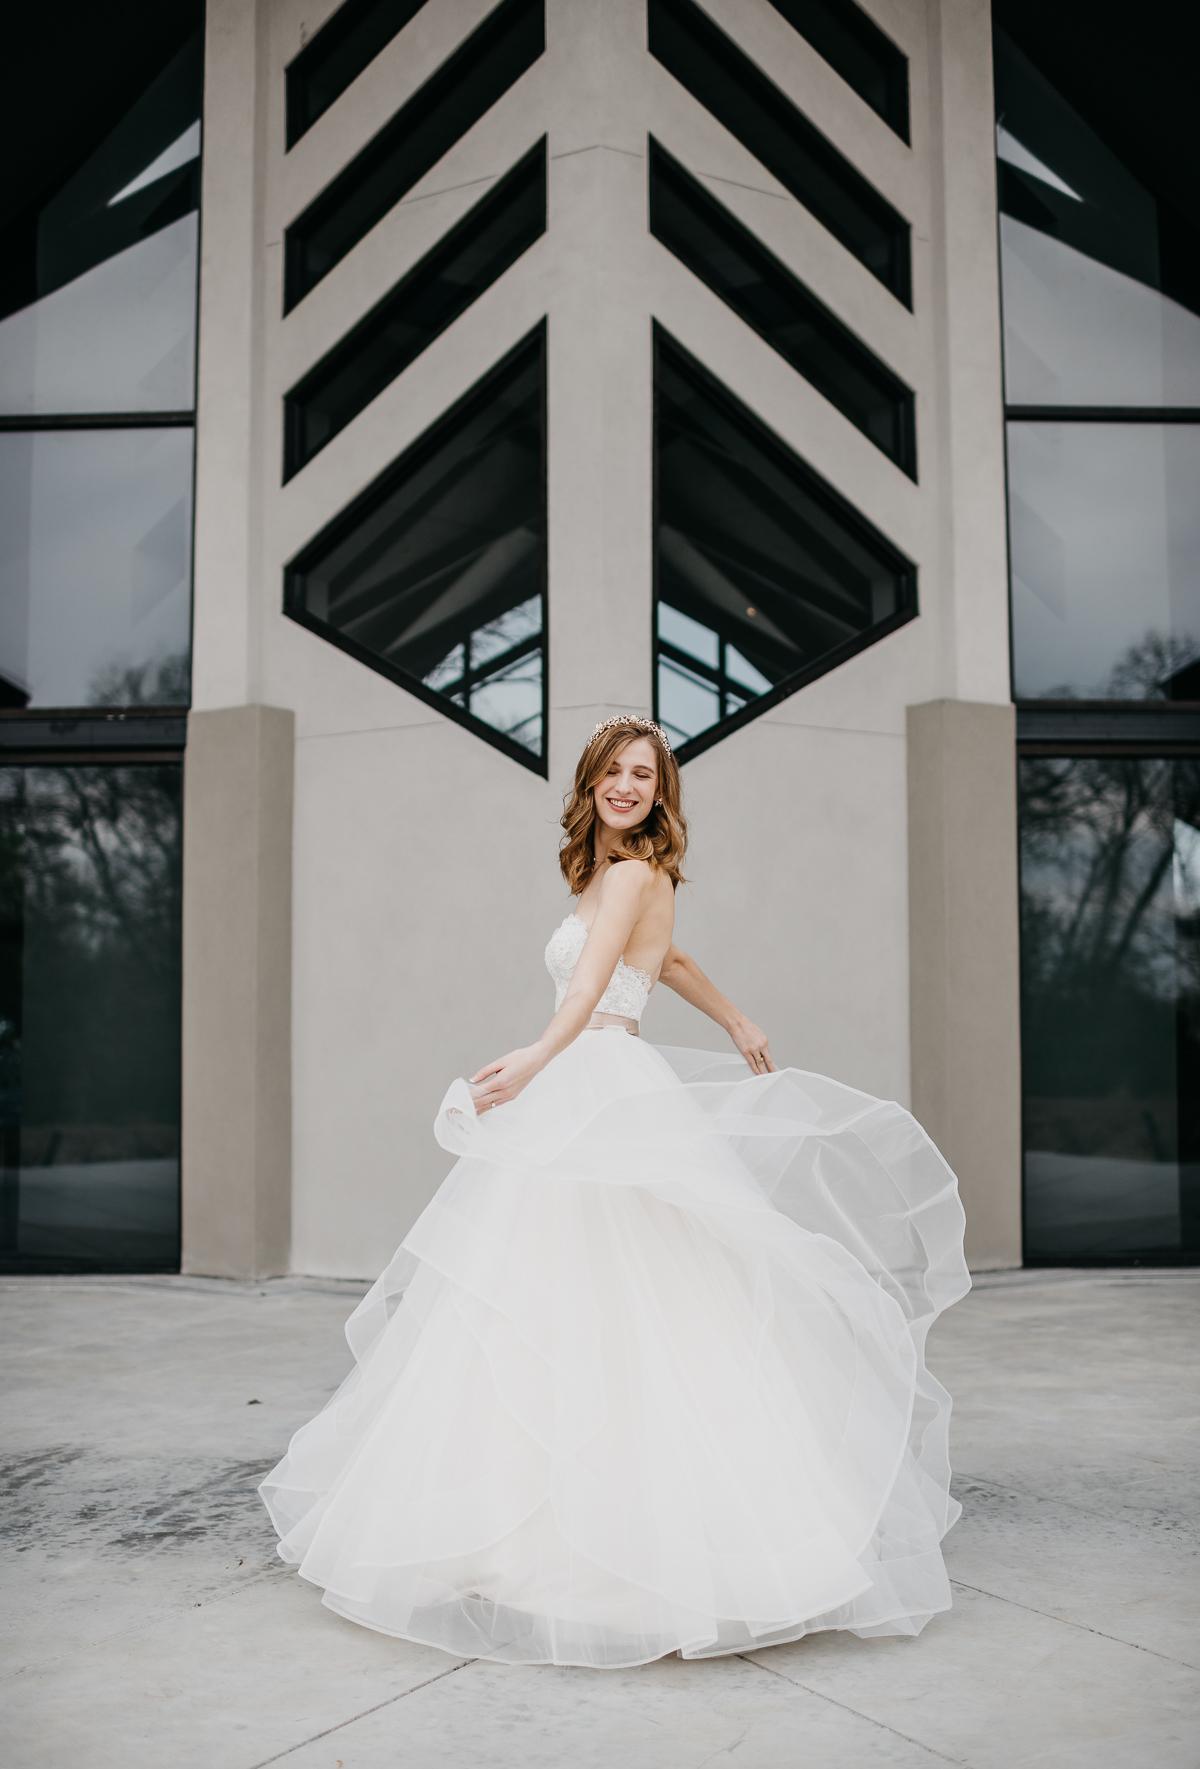 Modern elegant carefree nature wedding at Jennings Trace wedding venue in Conroe Texas camera shi photography bride